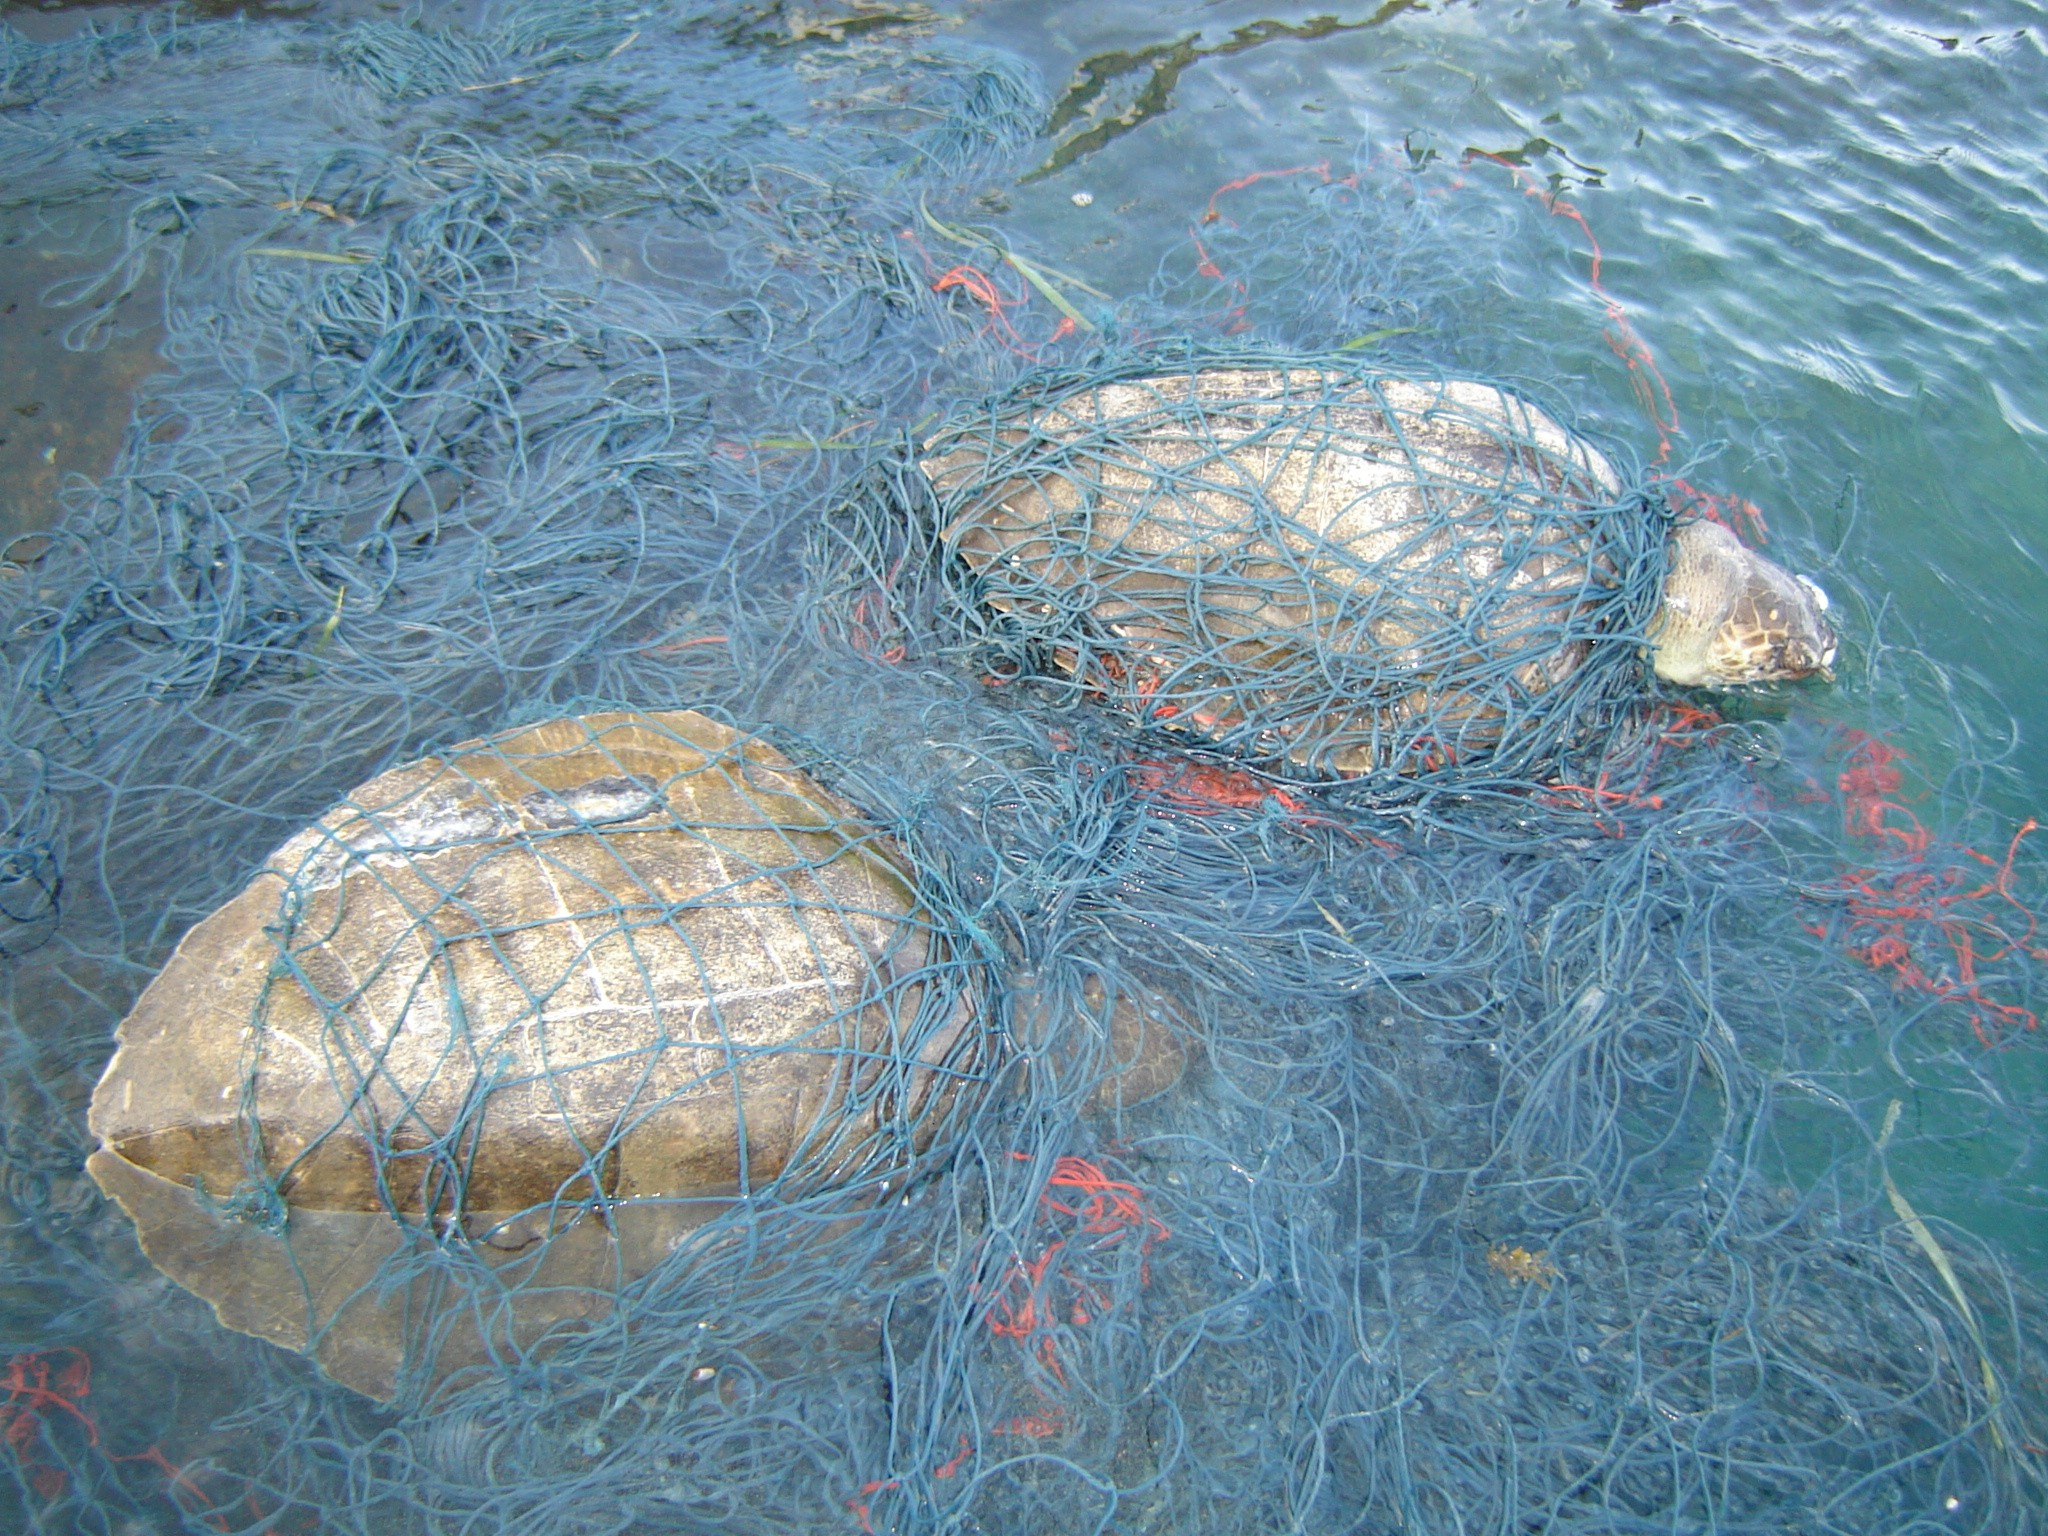 ... in Australië doden zeeschildpadden - Plastic Soup Foundation